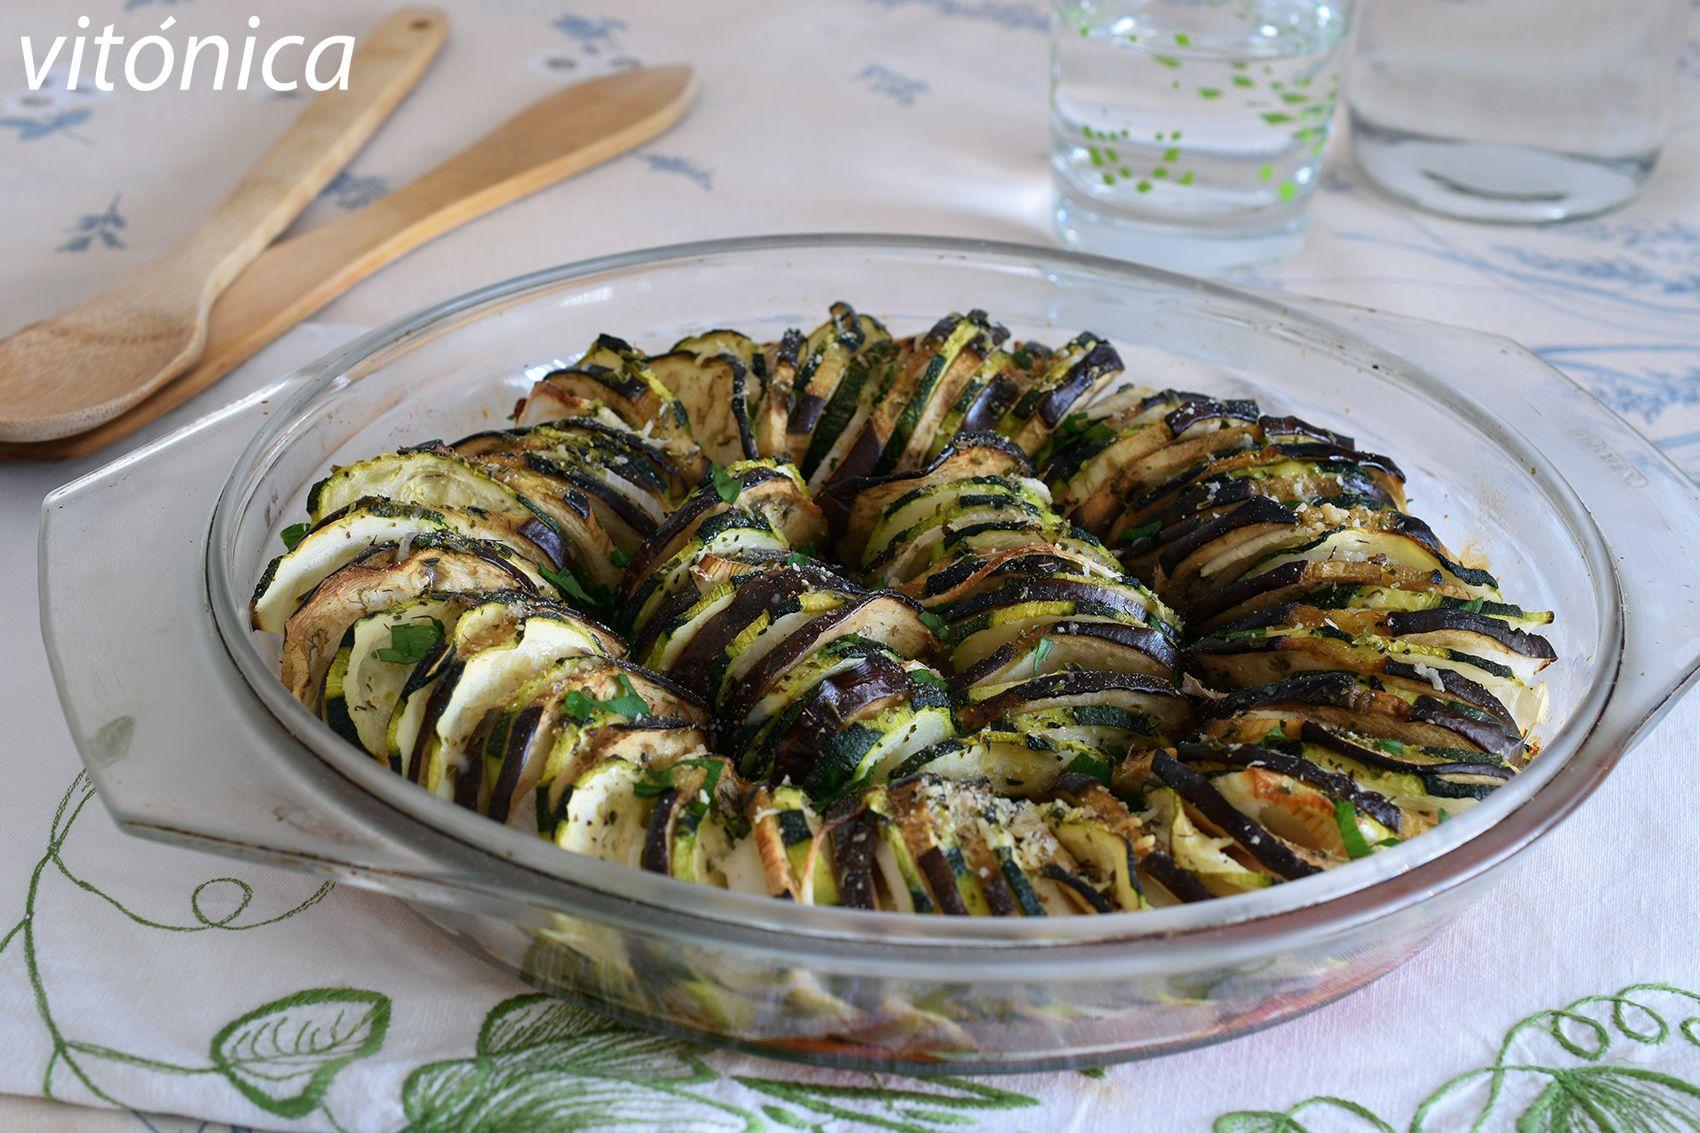 Verduras Al Horno Al Estilo Provenzal Receta Saludable Receta Verduras Al Horno Recetas Saludables Verduras